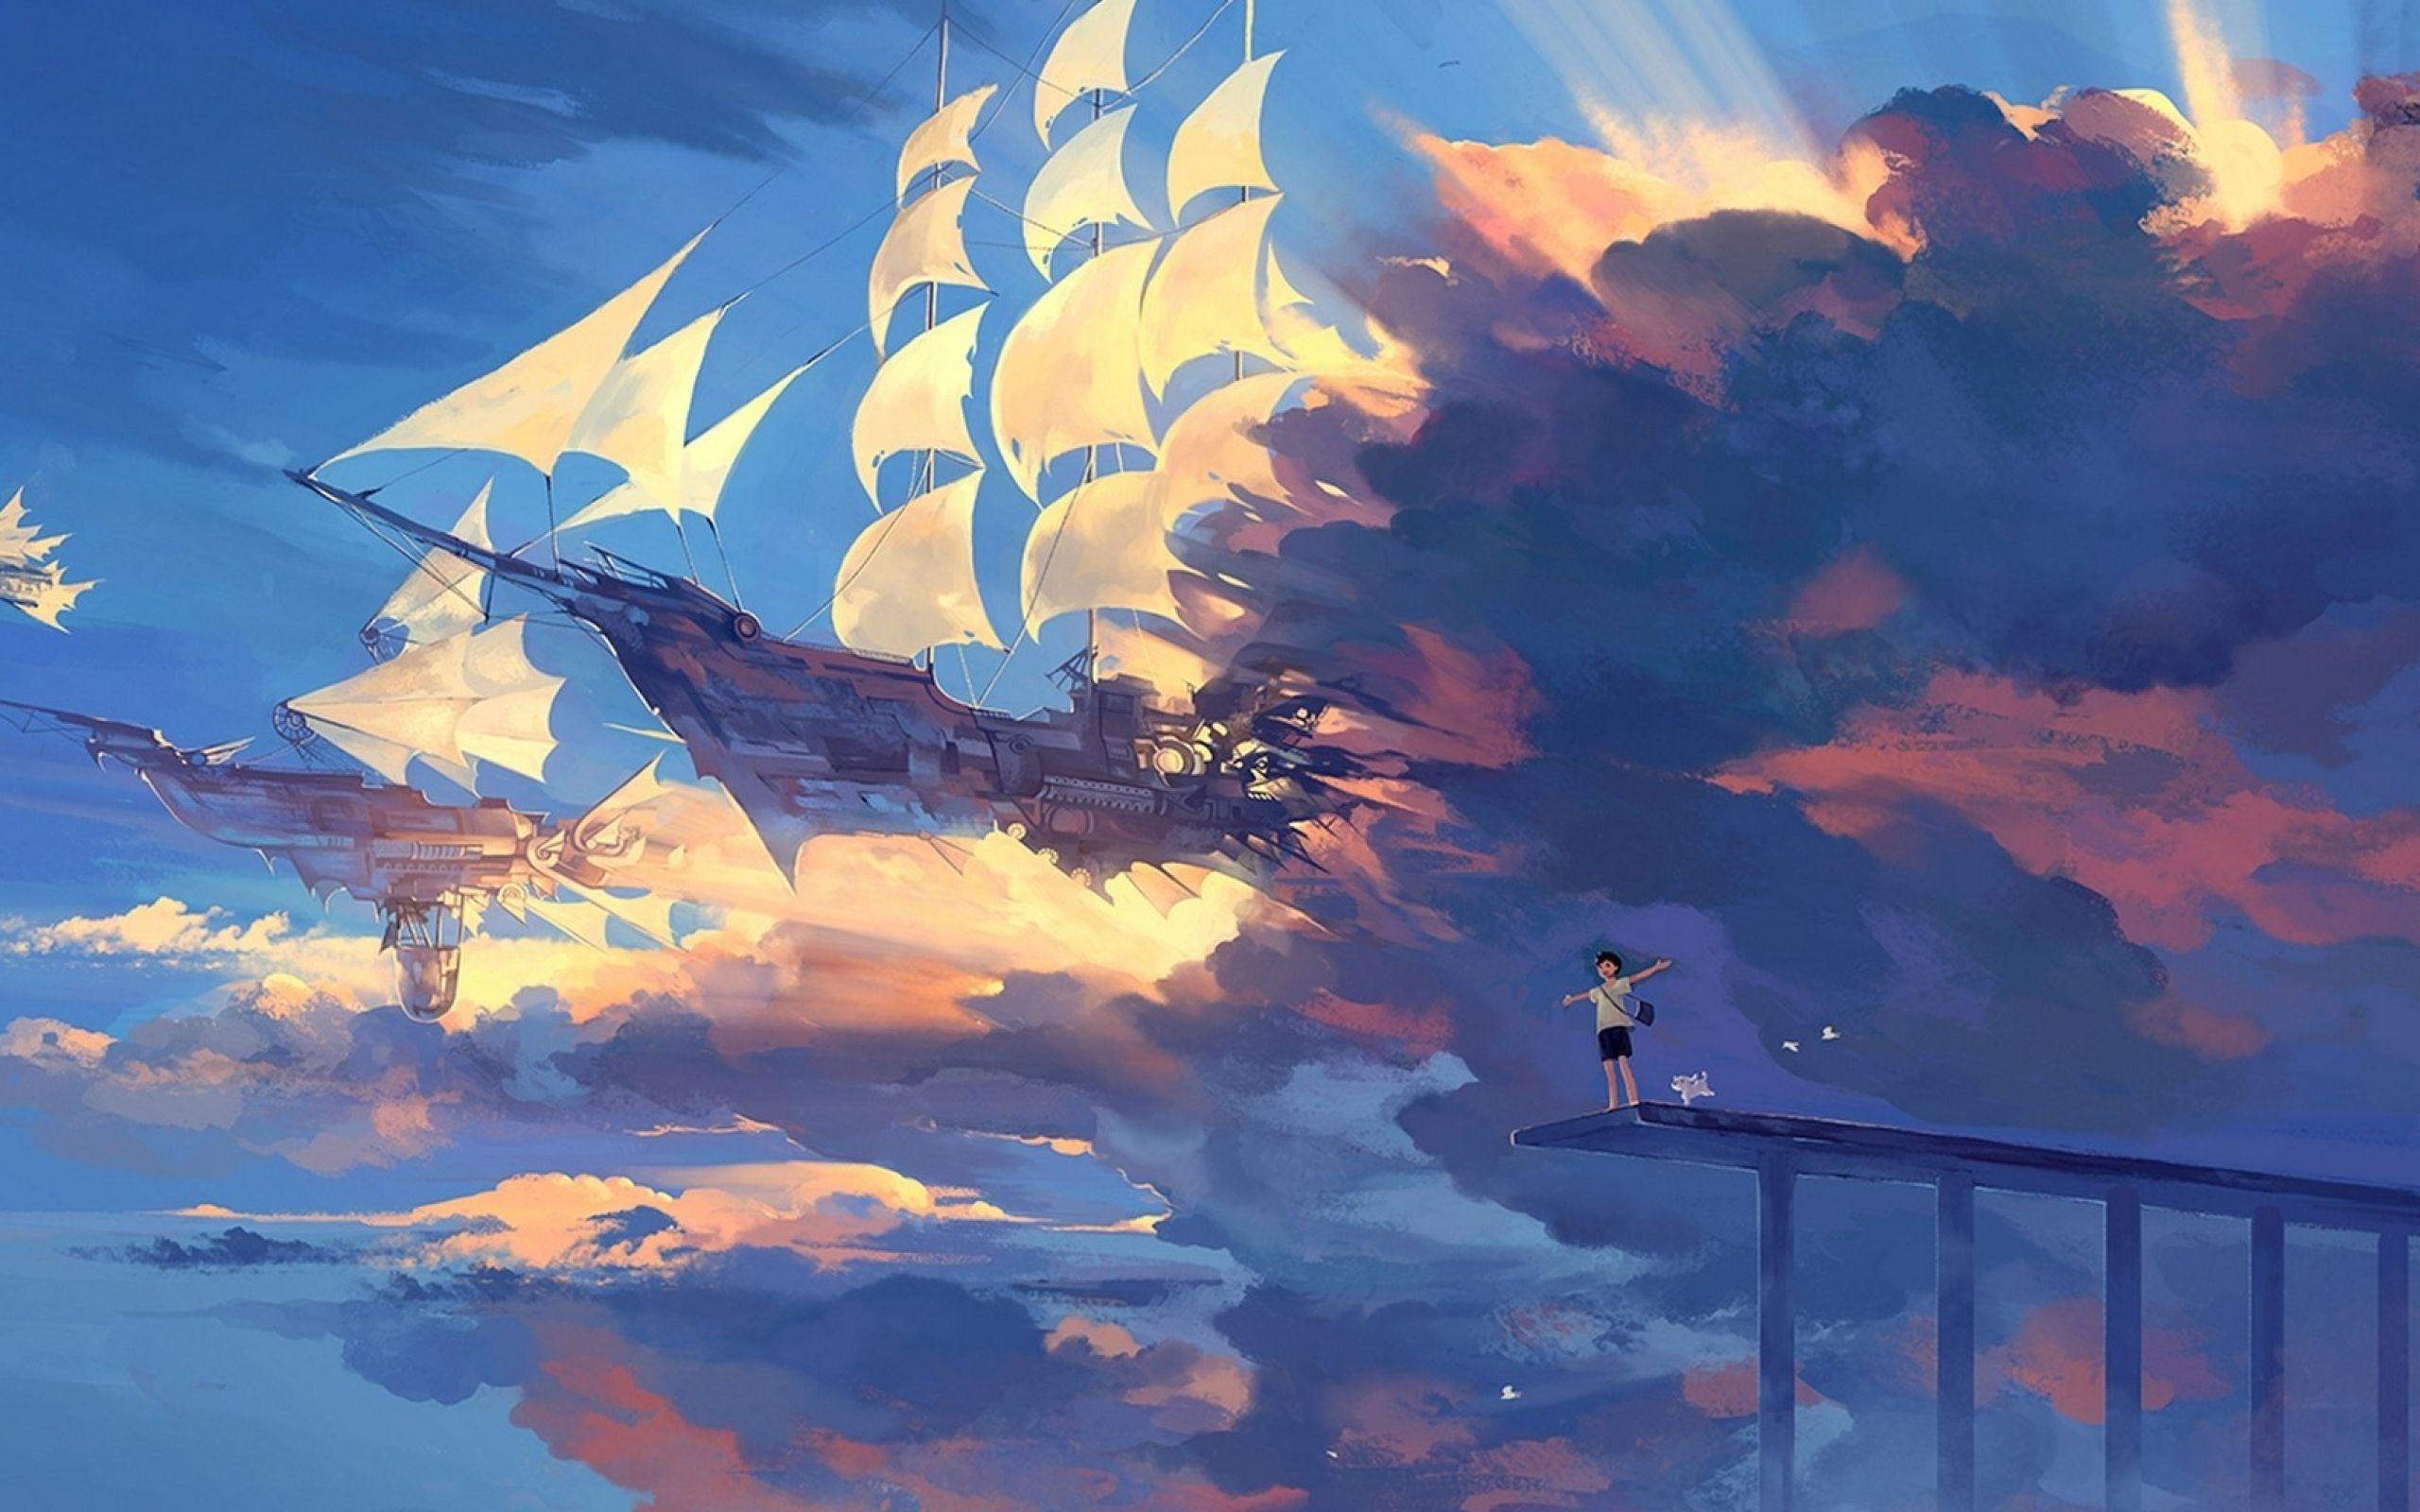 Anime Sky Wallpaper For Desktop 2560X1600 Px 1.00 Mb avec Fond D'Ecran Hd Themes Elie S Book